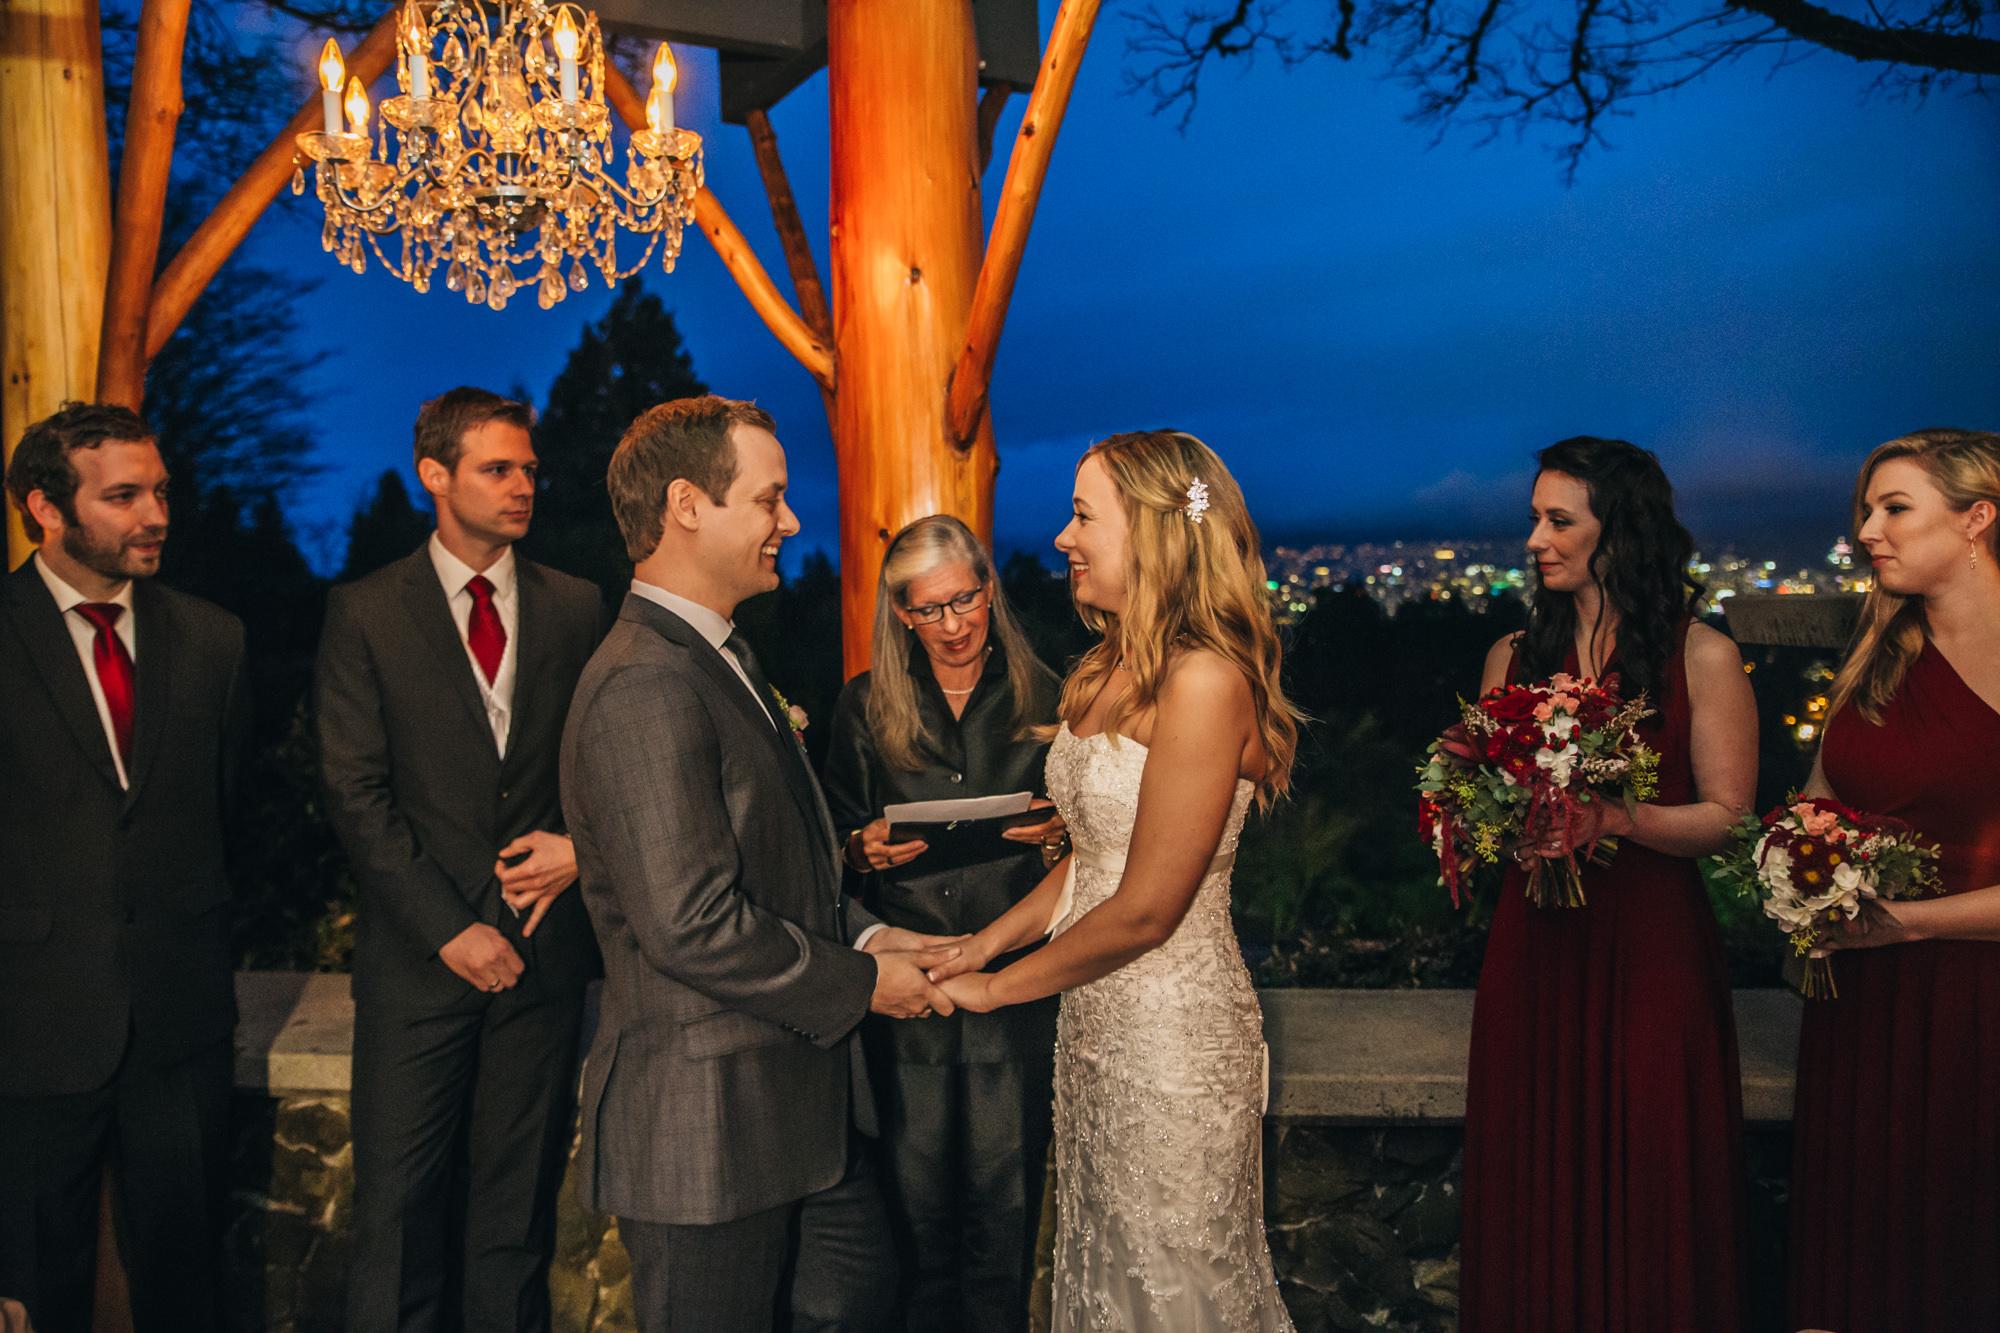 28-seasons-in-the-park-wedding-ceremony.jpg